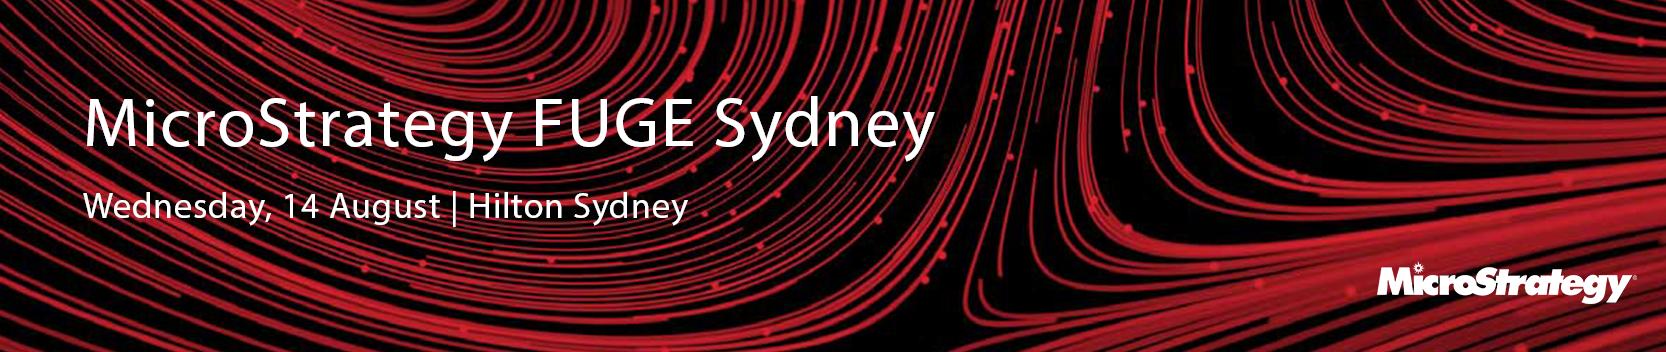 MicroStrategy FUGE Sydney